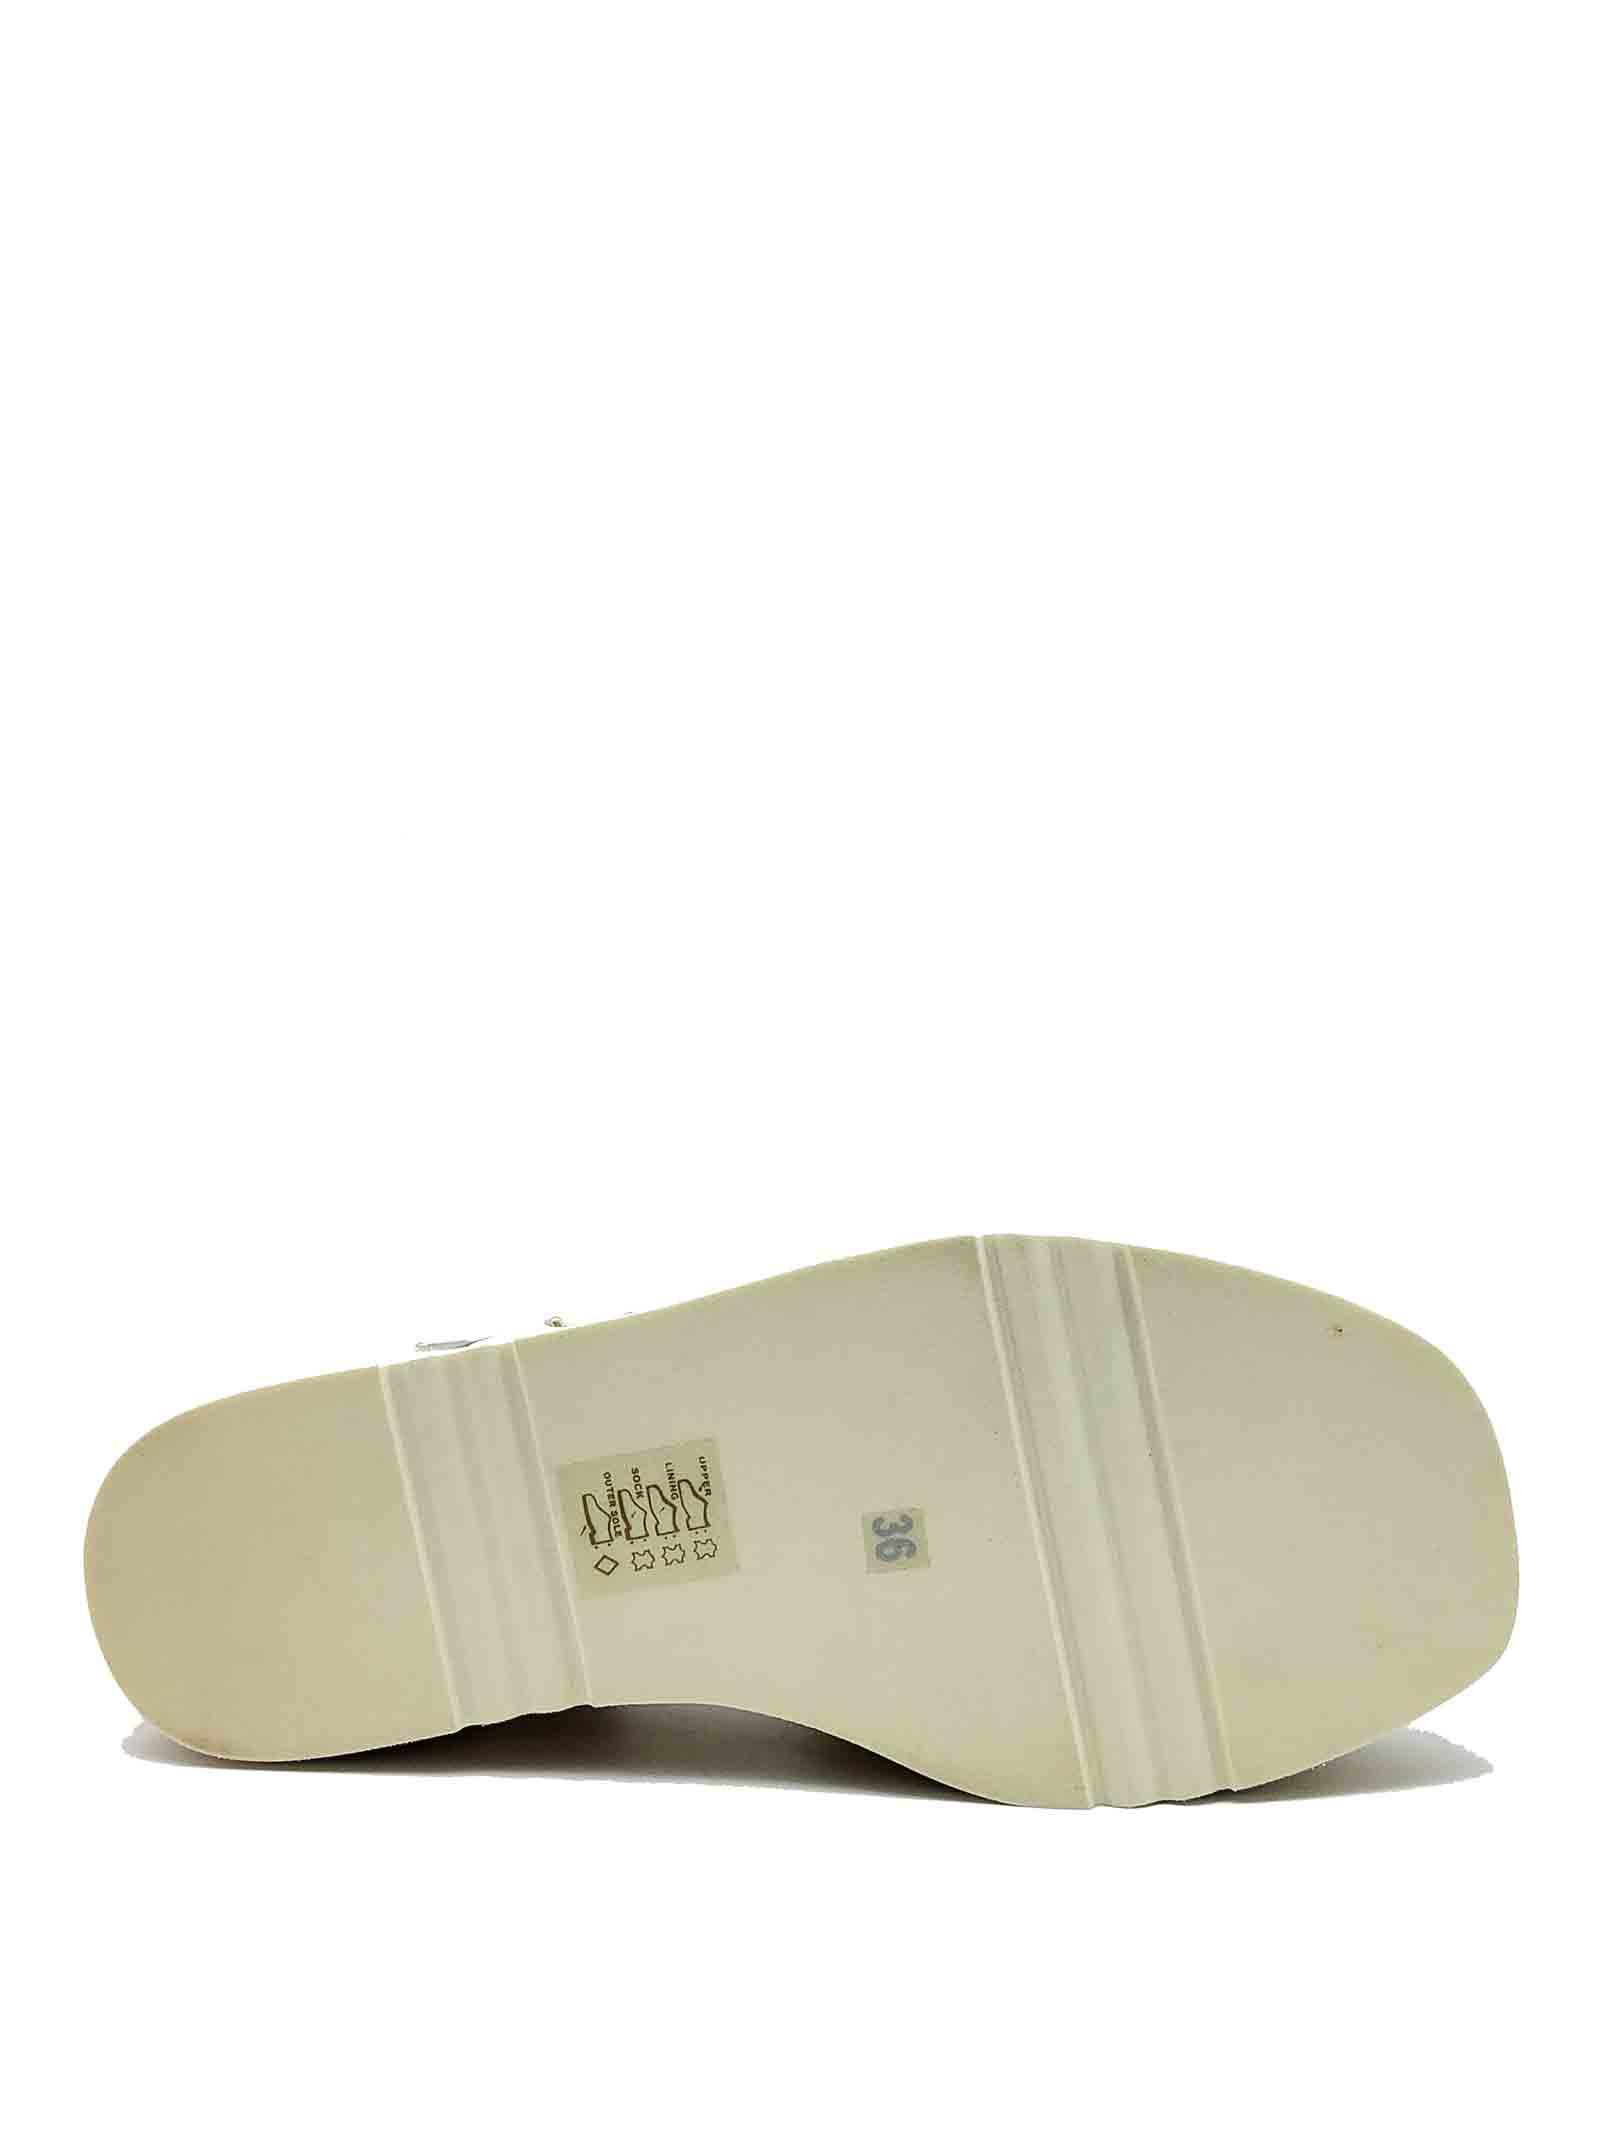 Bruno Premi   Wedge Sandals   BB2604X100